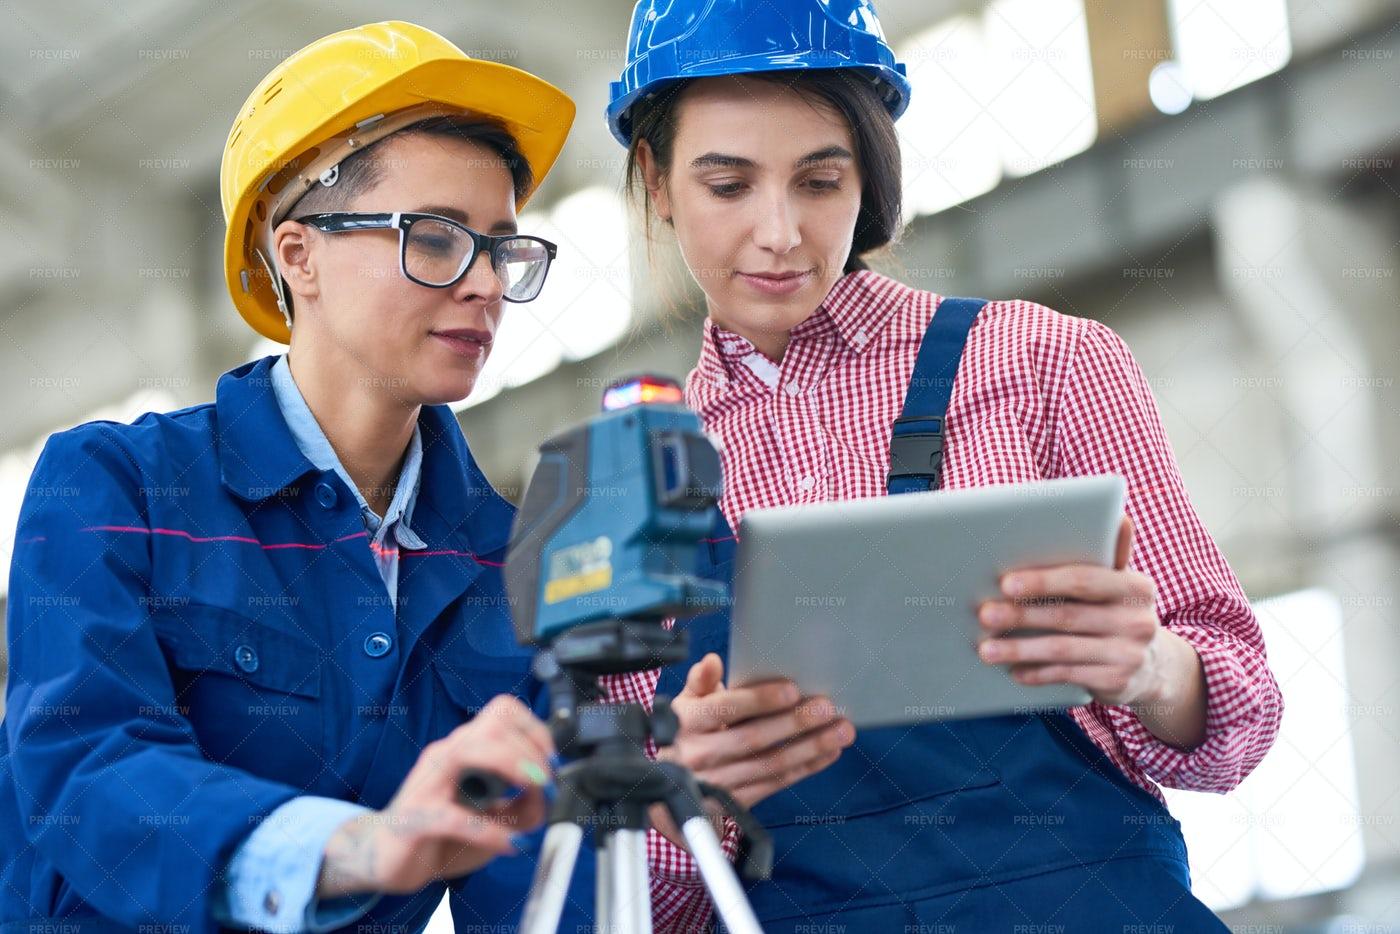 Pretty Surveyors Focused On Work: Stock Photos